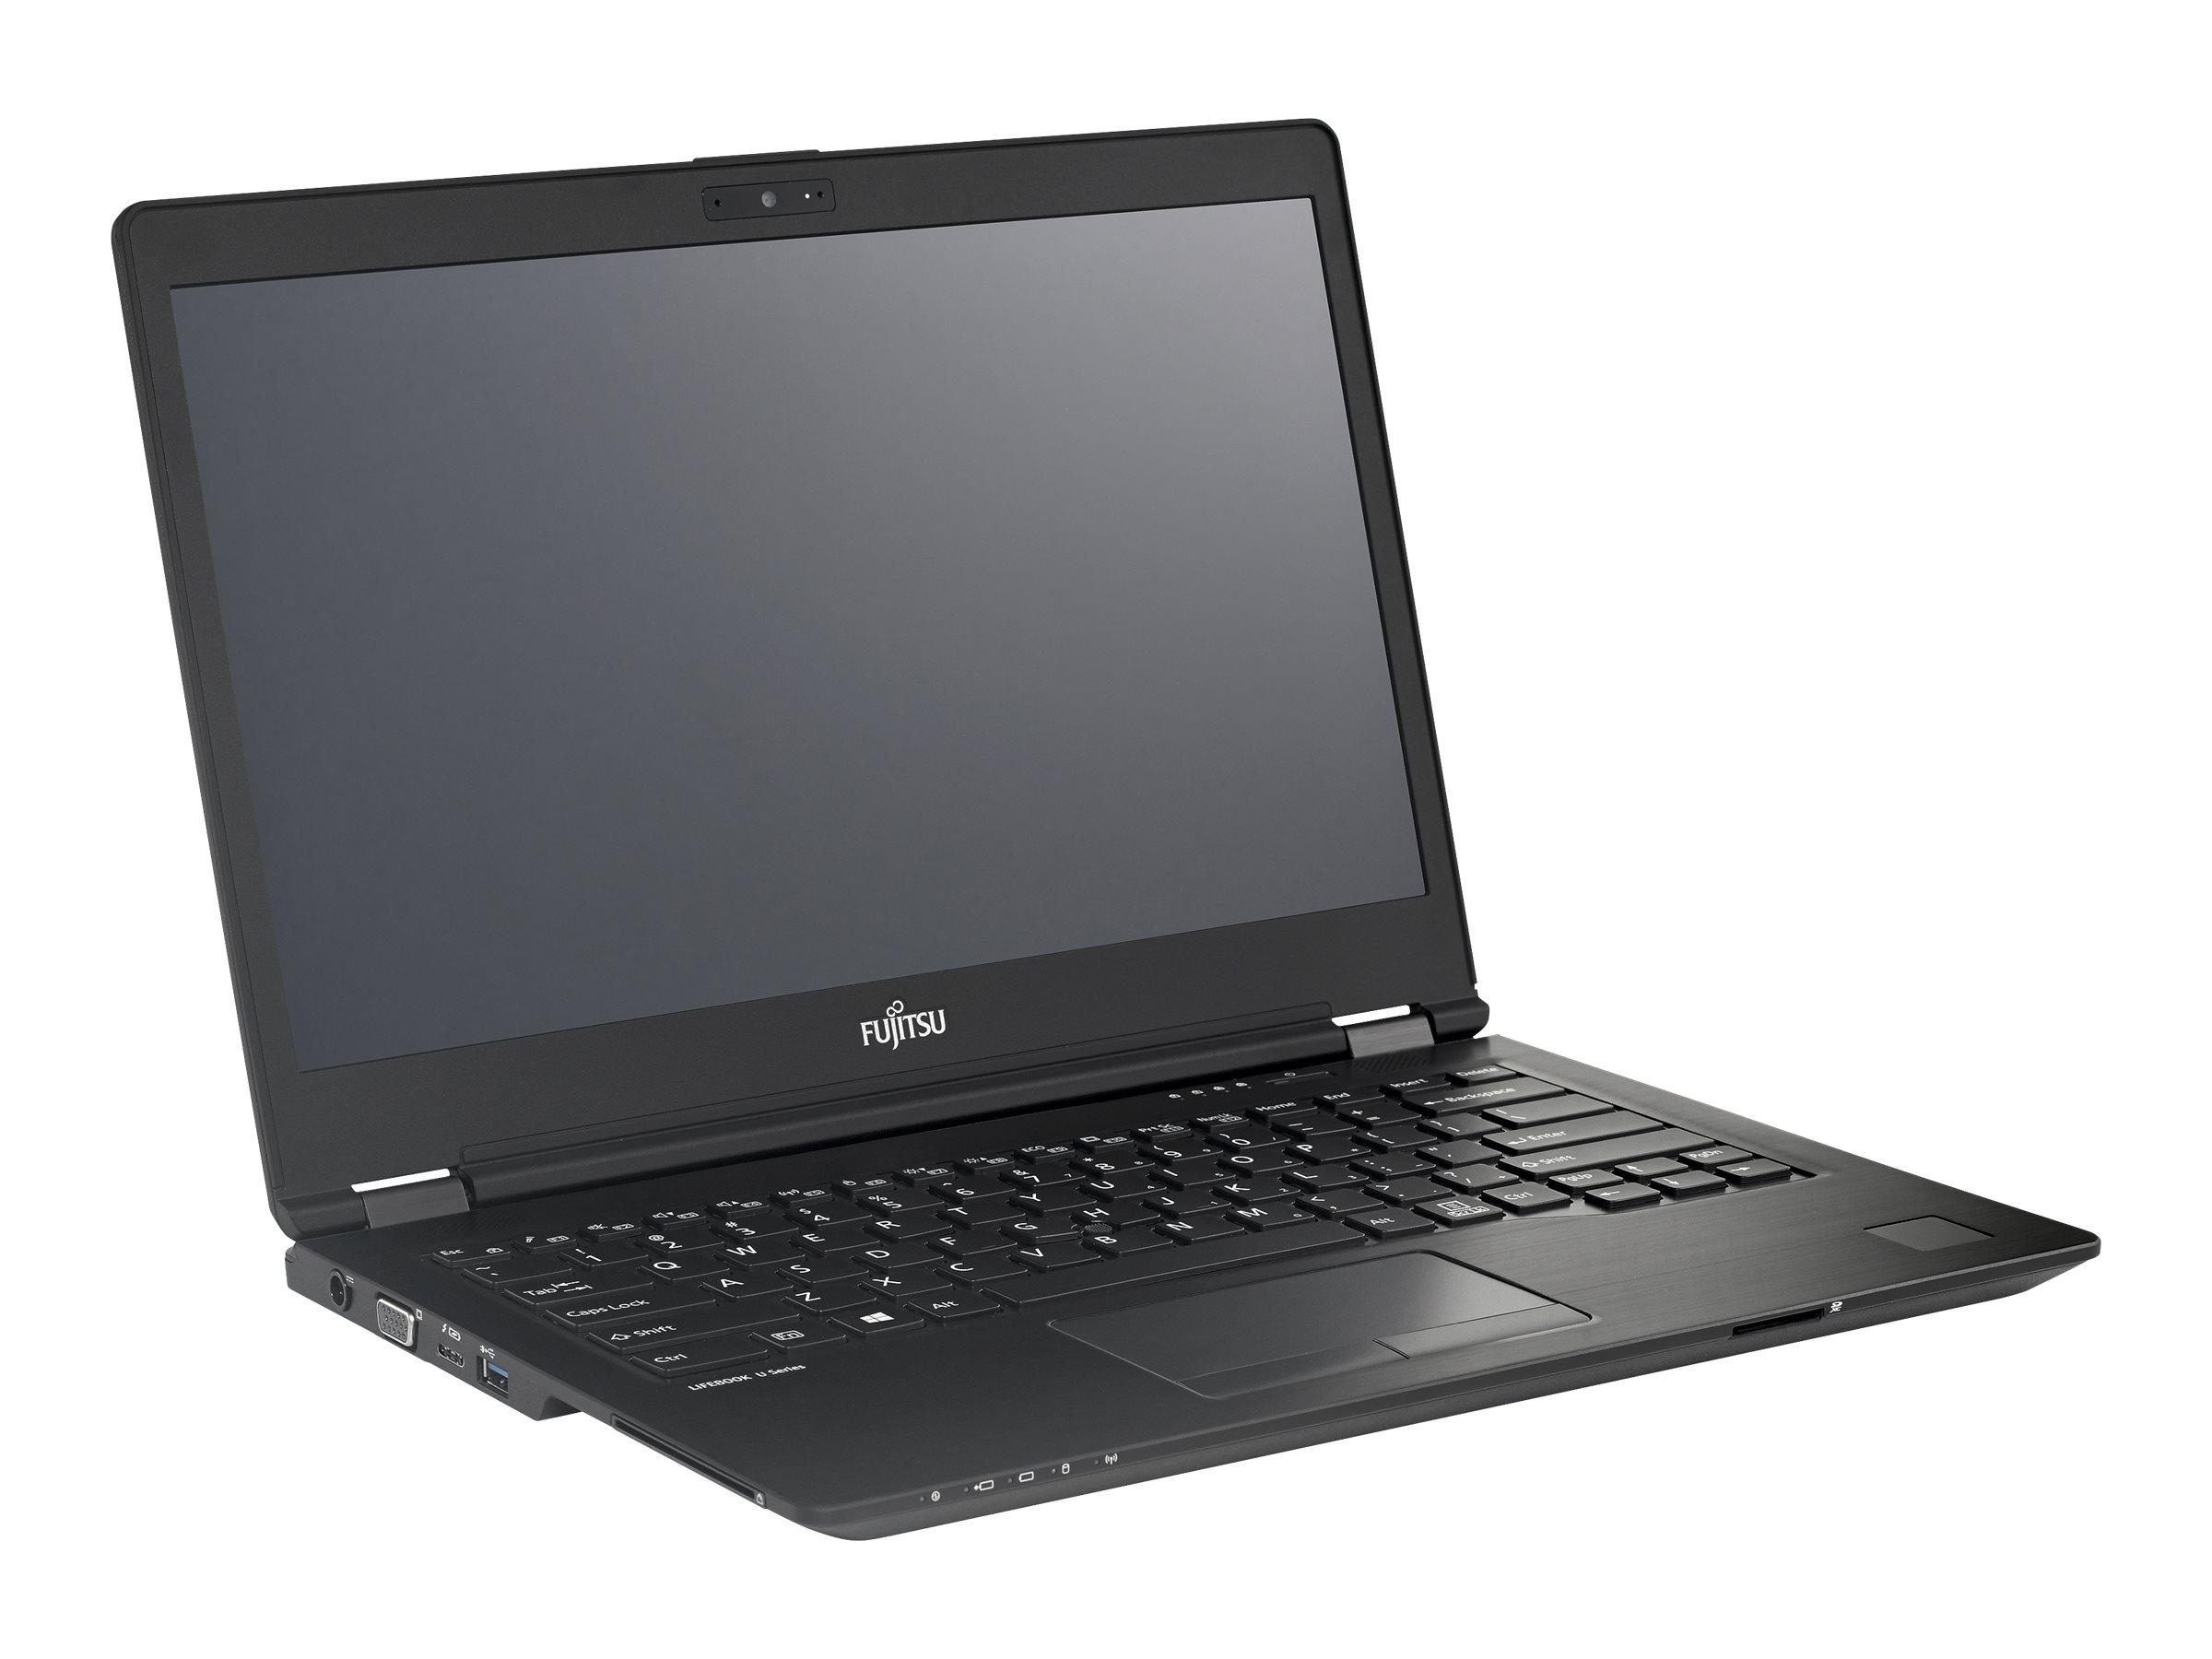 "Fujitsu LIFEBOOK U7410 - Core i5 10310U / 1.7 GHz - Win 10 Pro - 8 GB RAM - 512 GB SSD SED, NVMe, Wert Ausdauer - 35.6 cm (14"")"